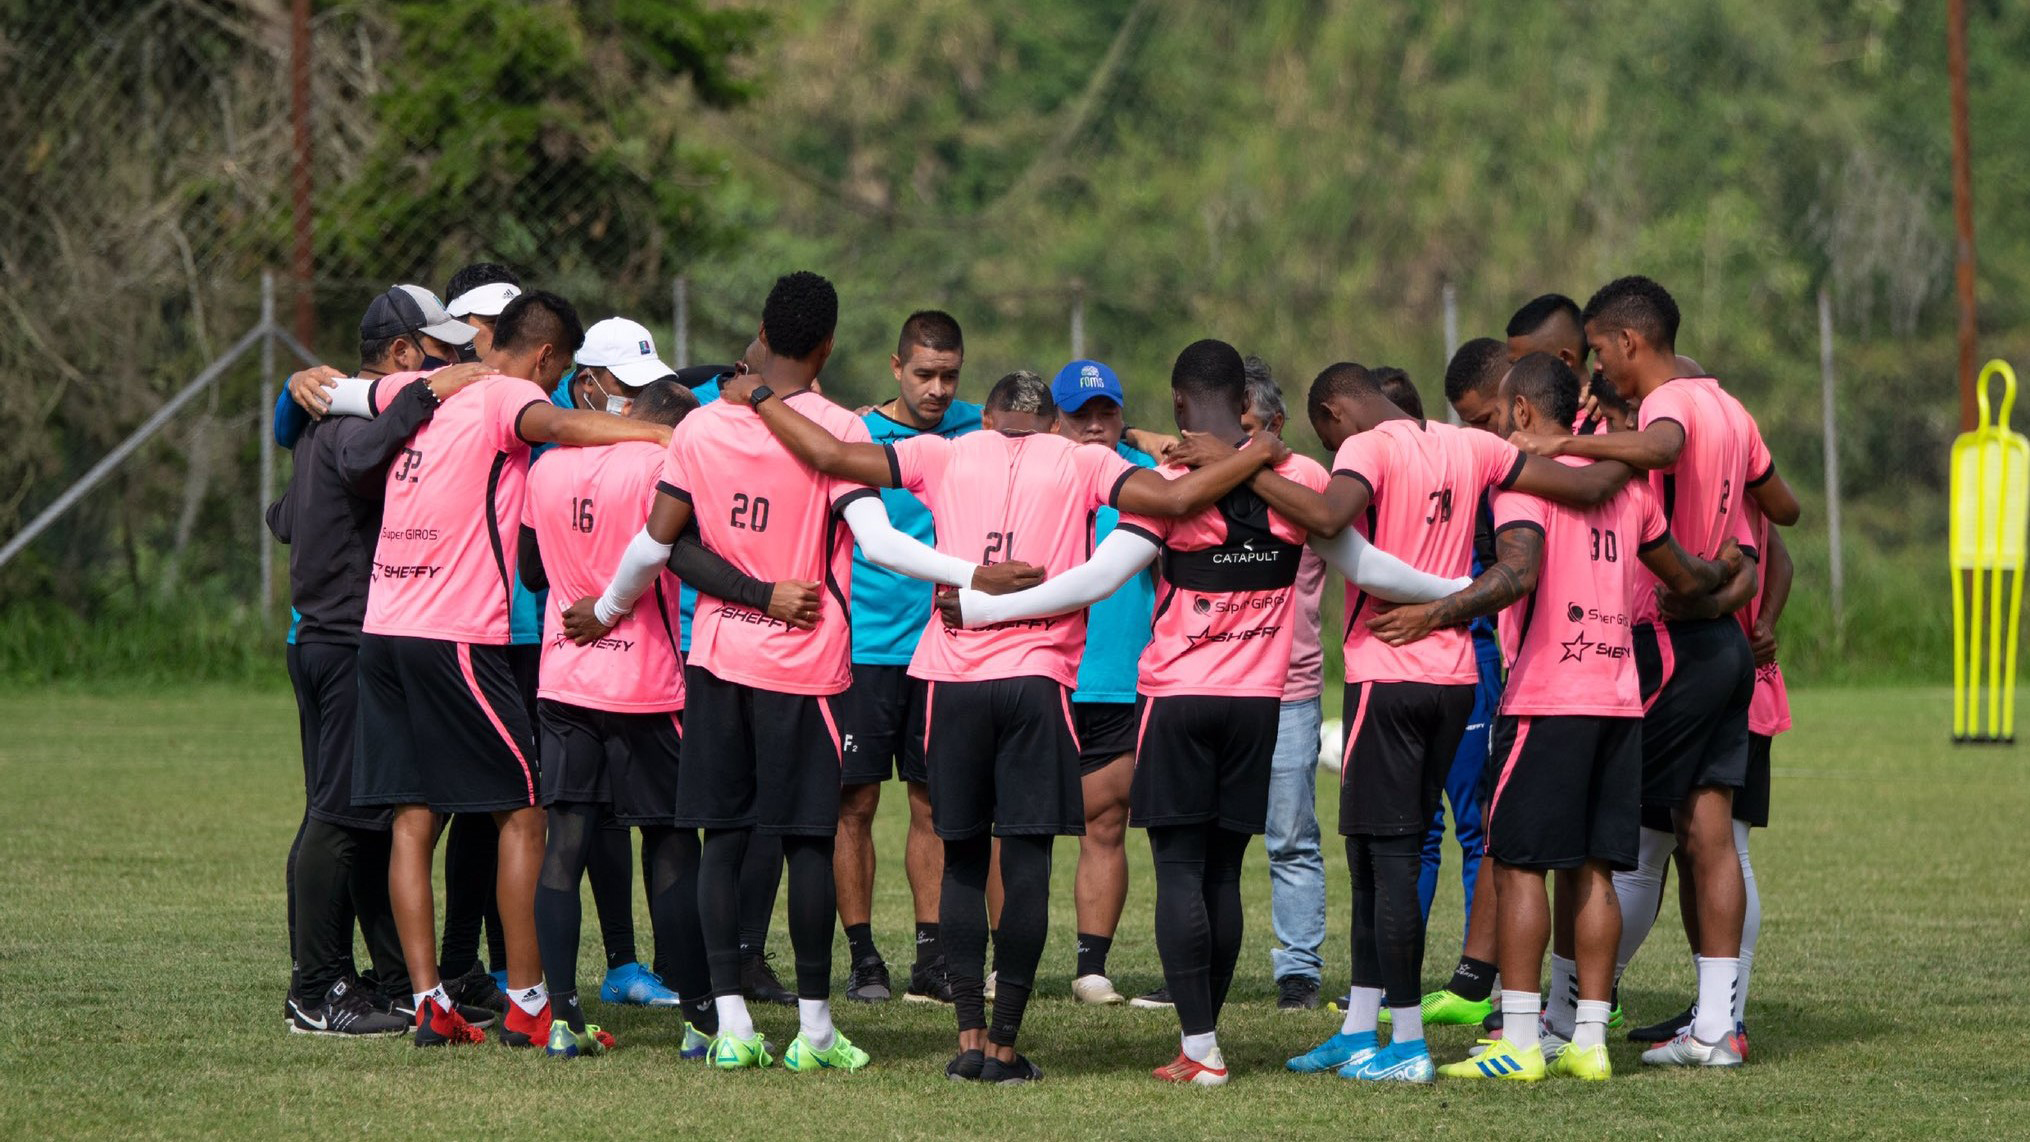 Juan-Carlos-Henao-se-retira-del-futbol-Once-Caldas-Casa-Blanca-OC